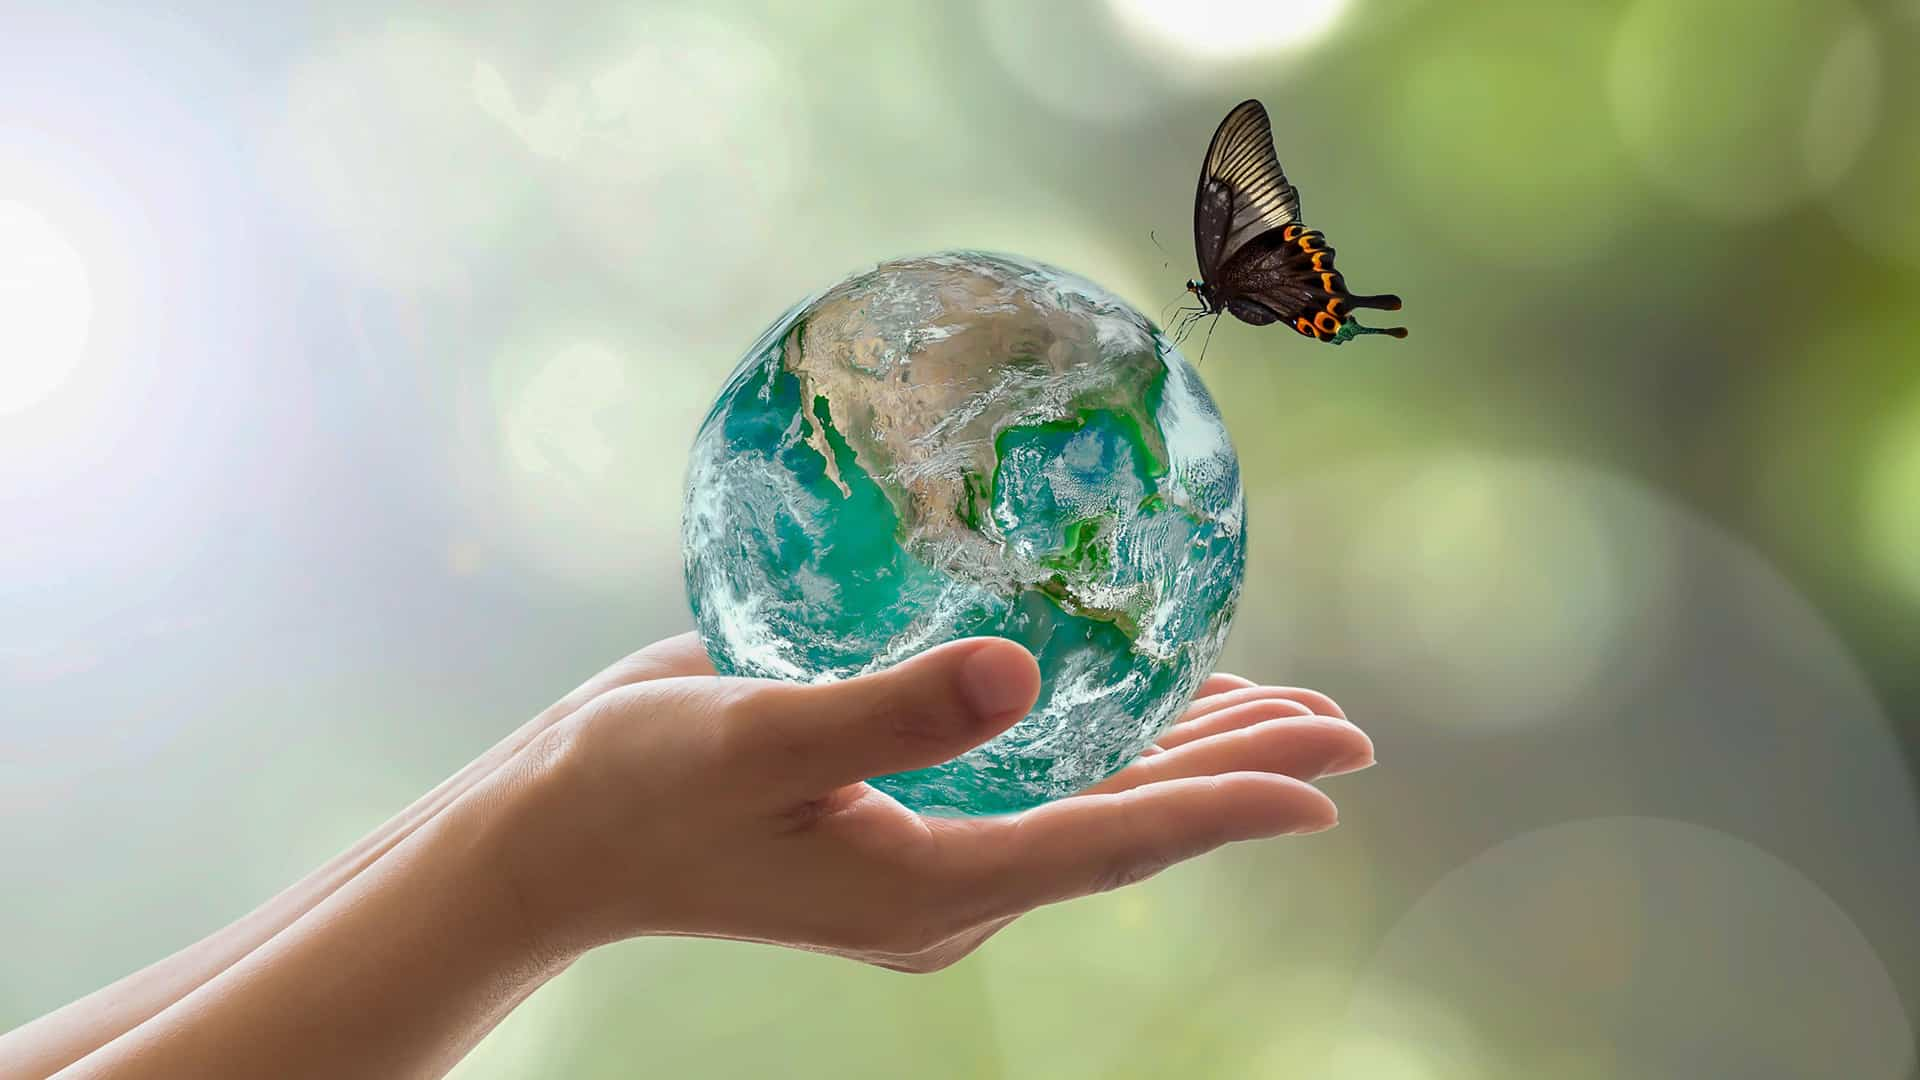 Terra, Madre di tutte le creature